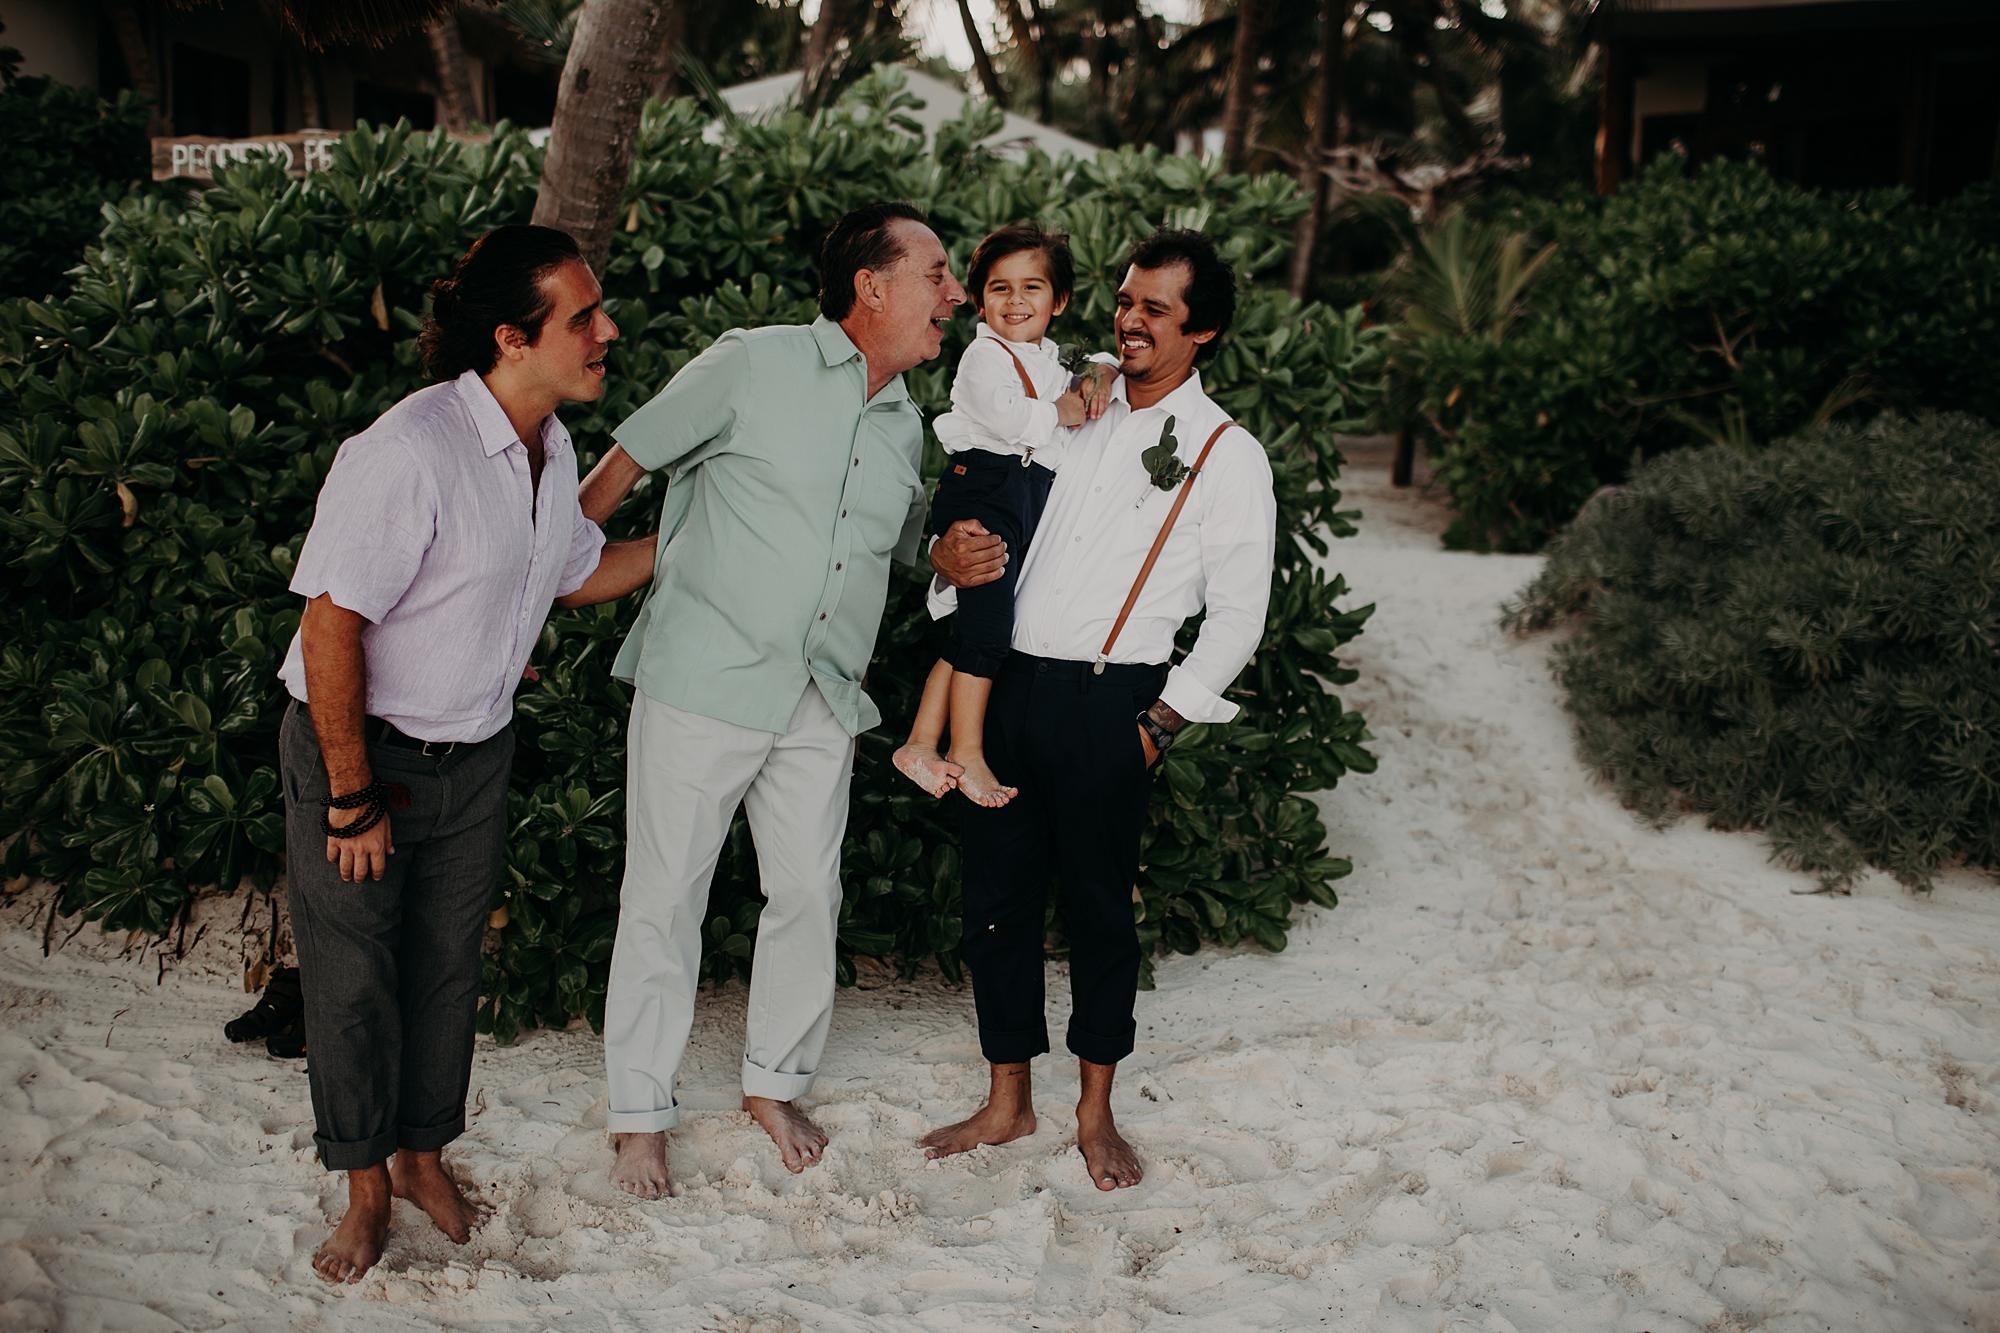 Danielle-San-Antonio-Wedding-Photographer-112_WEB.jpg